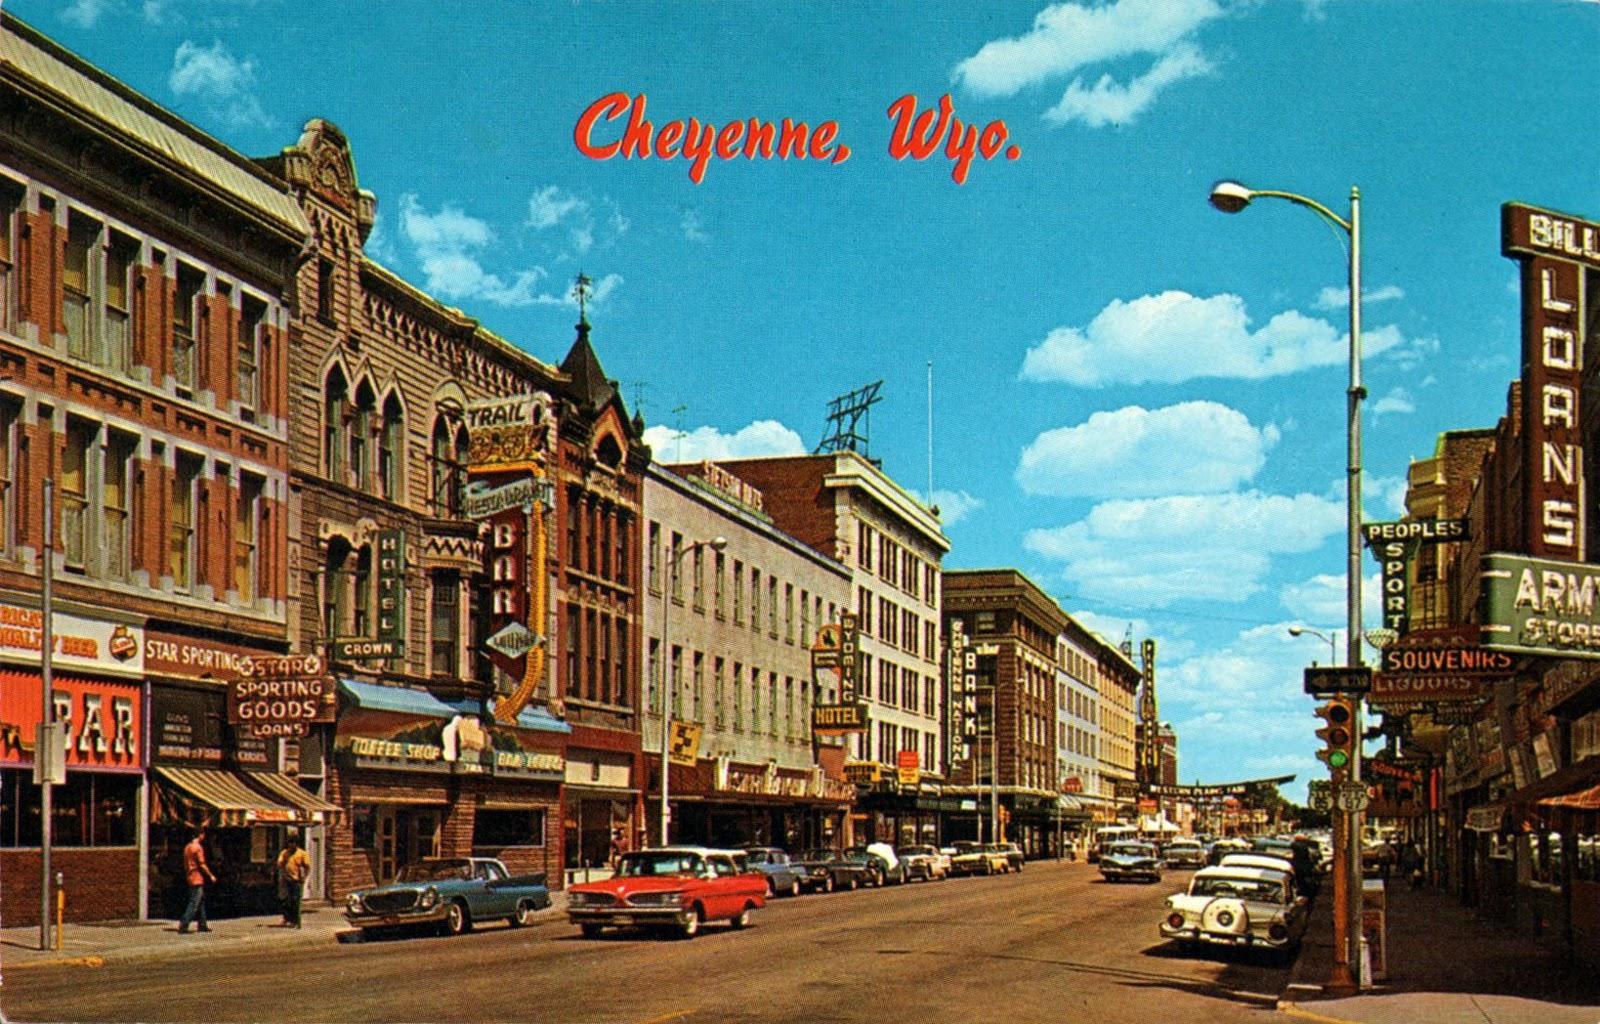 Free Cheyenne, Wyoming Stock Photo - FreeImages.com